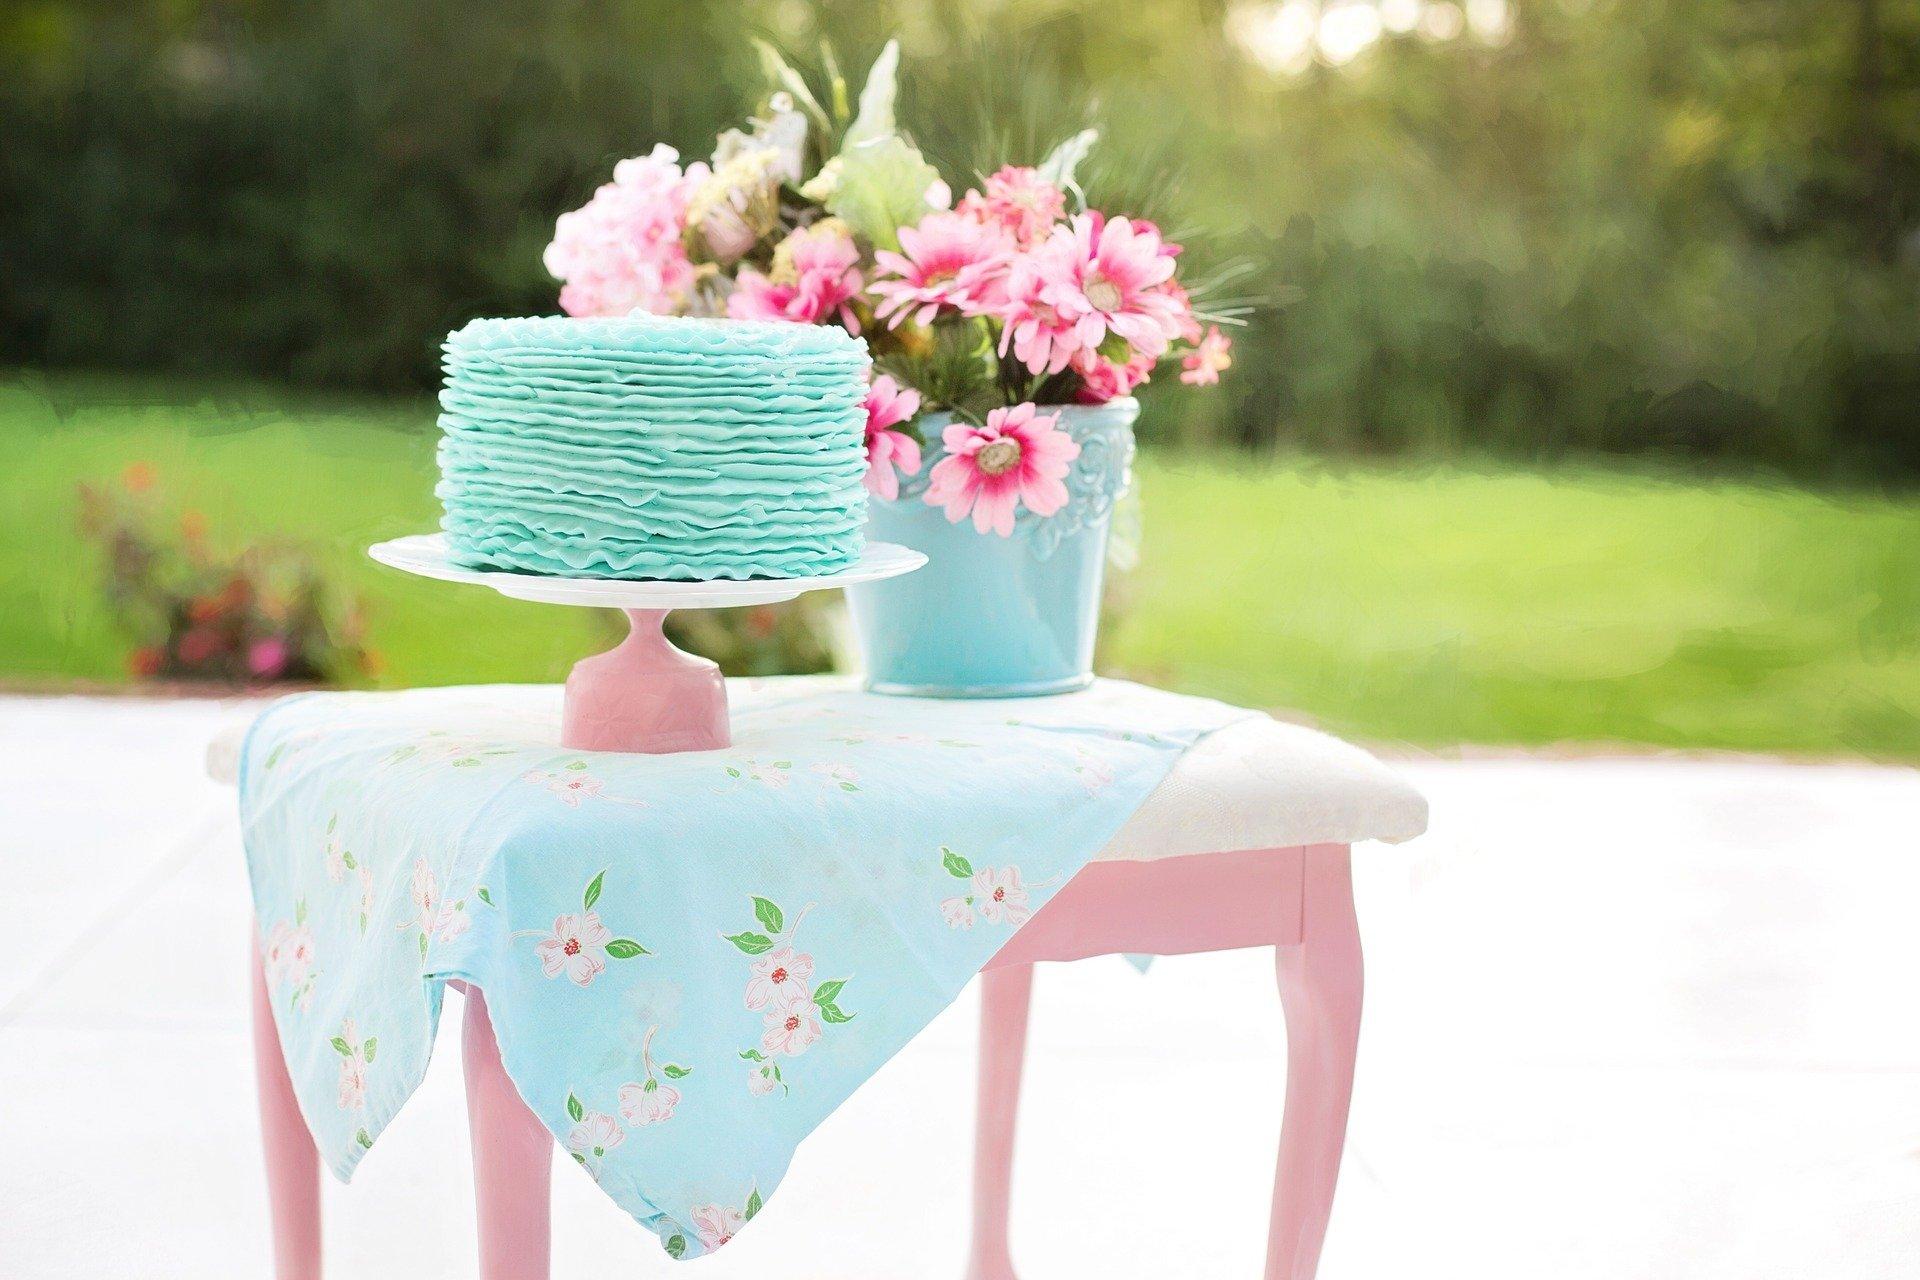 cake-905376_1920